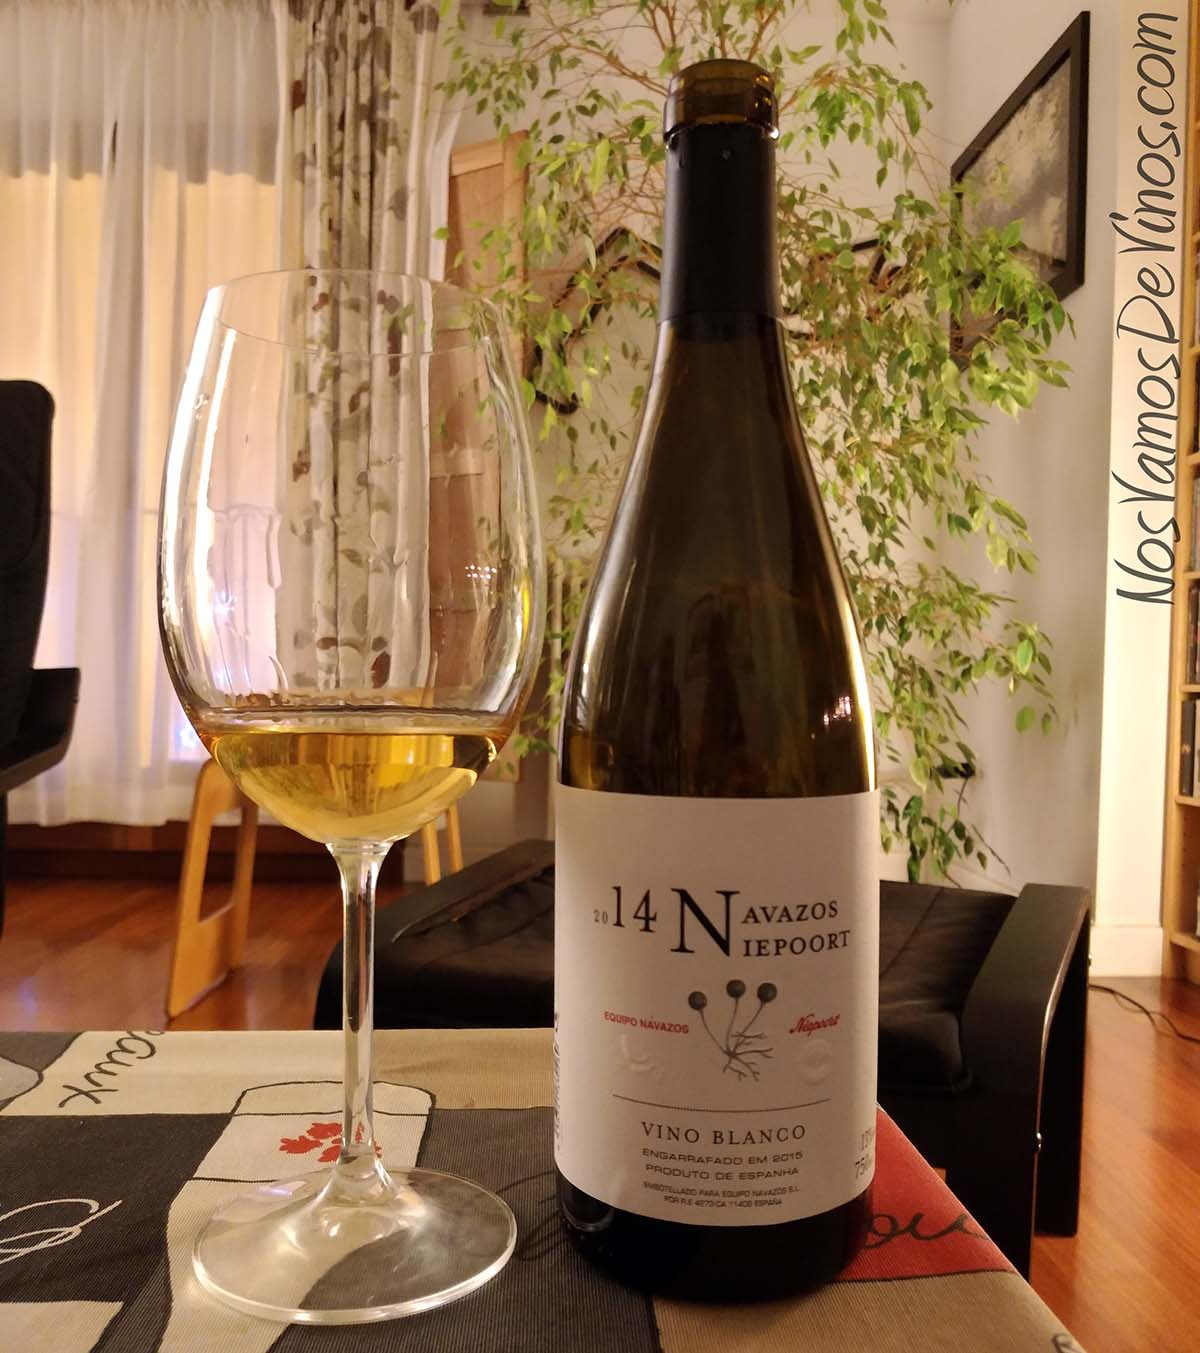 Navazos Niepoort 2014 Vino Blanco